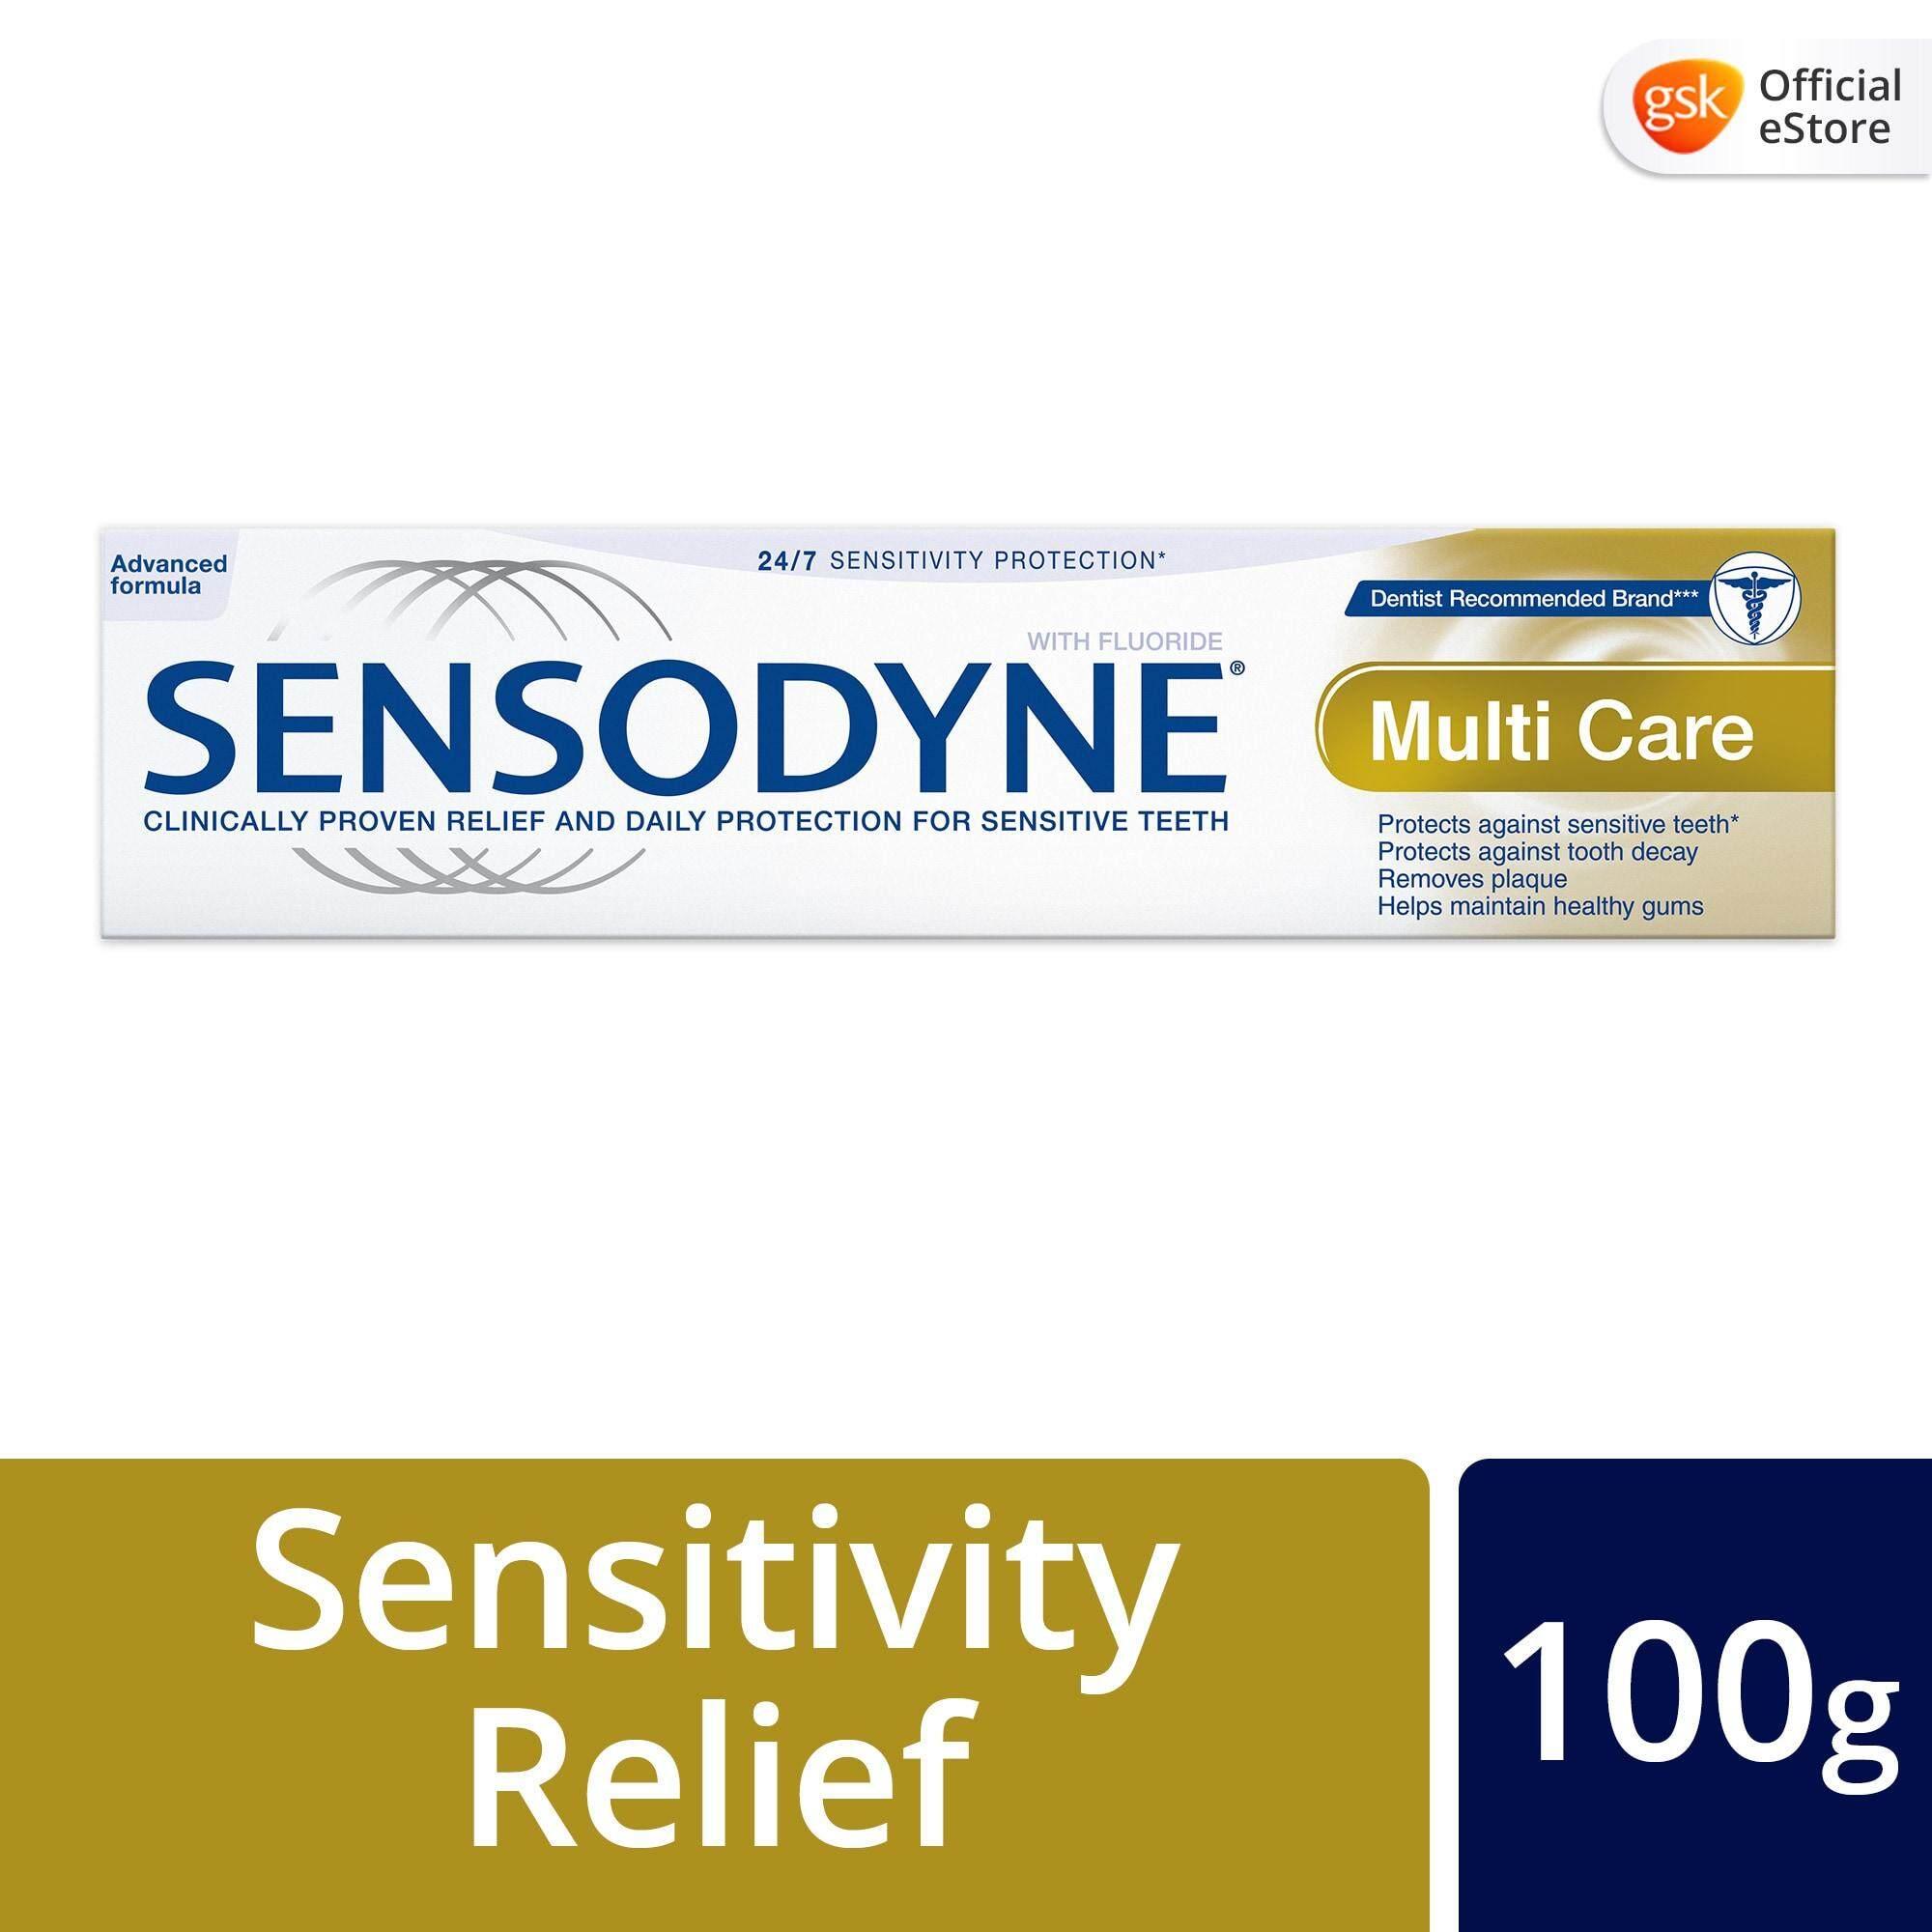 Sensodyne Sensitive Daily Care Multi Care Toothpaste, (1 x 100 g)